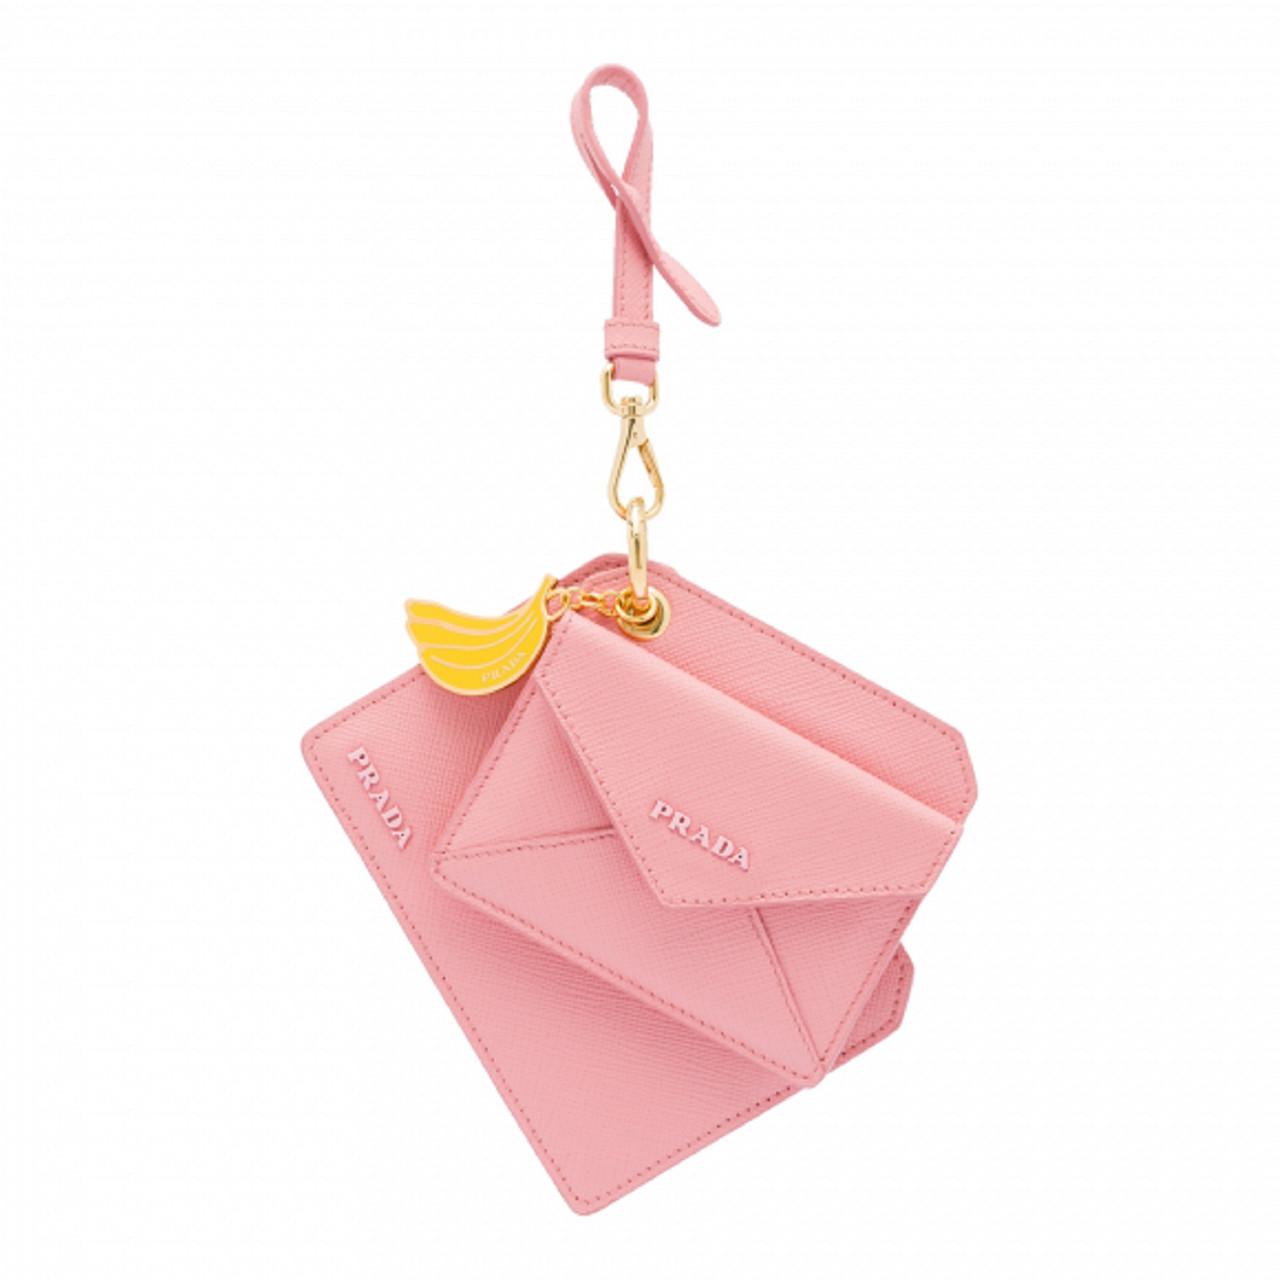 Prada Saffiano Lux Banana Charm Pink Keychain Wallet Card Case